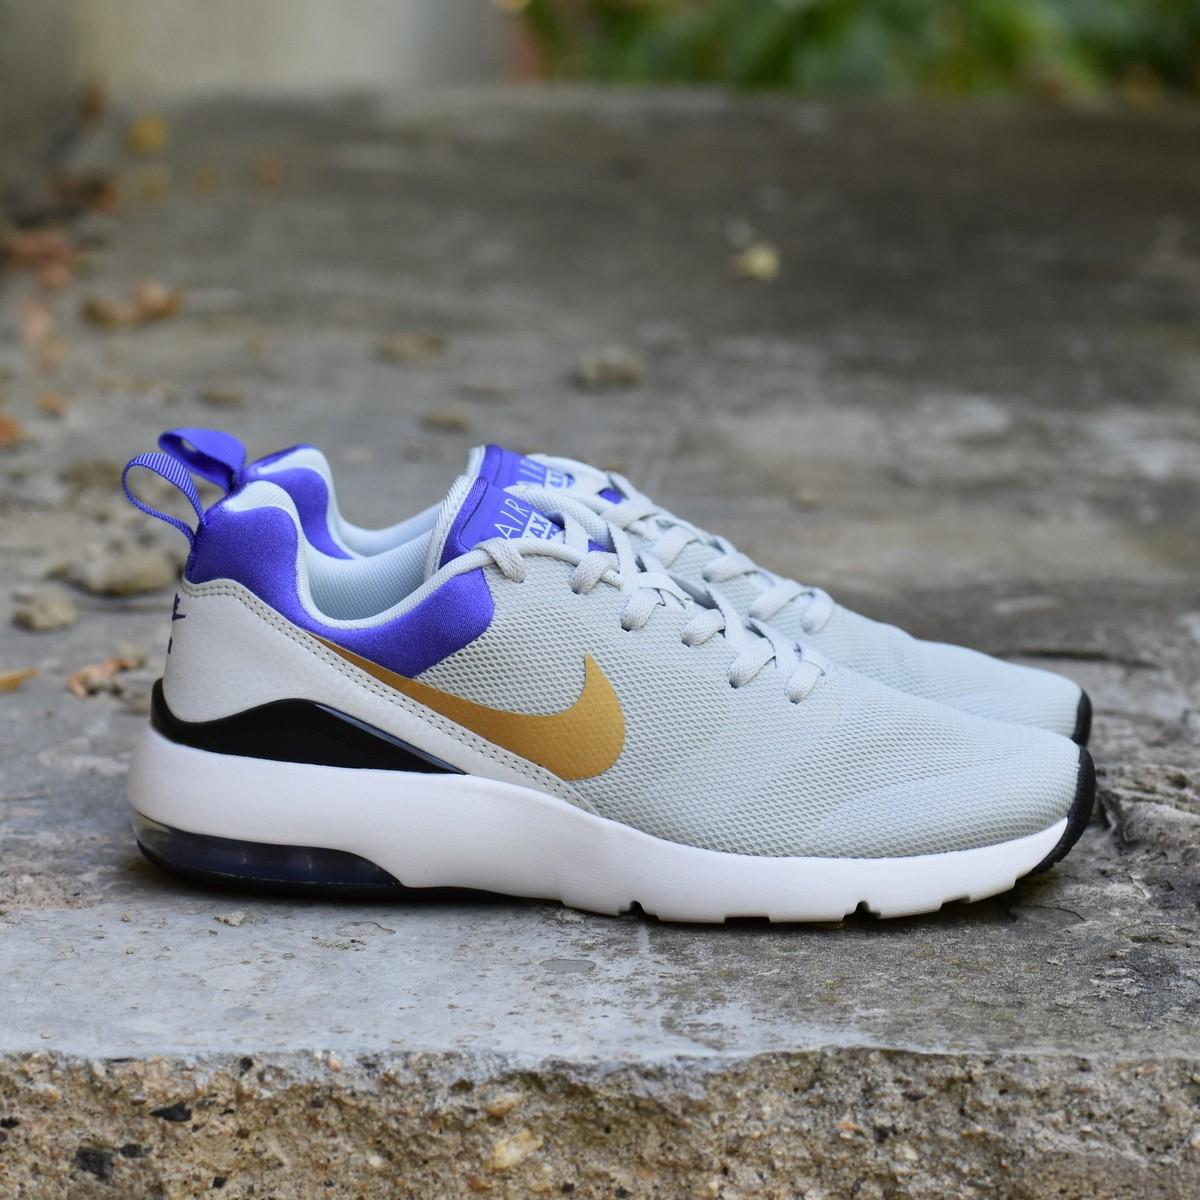 39997c79bab Nike WMNS AIR MAX SIREN Dámské boty EU 36 749510-001